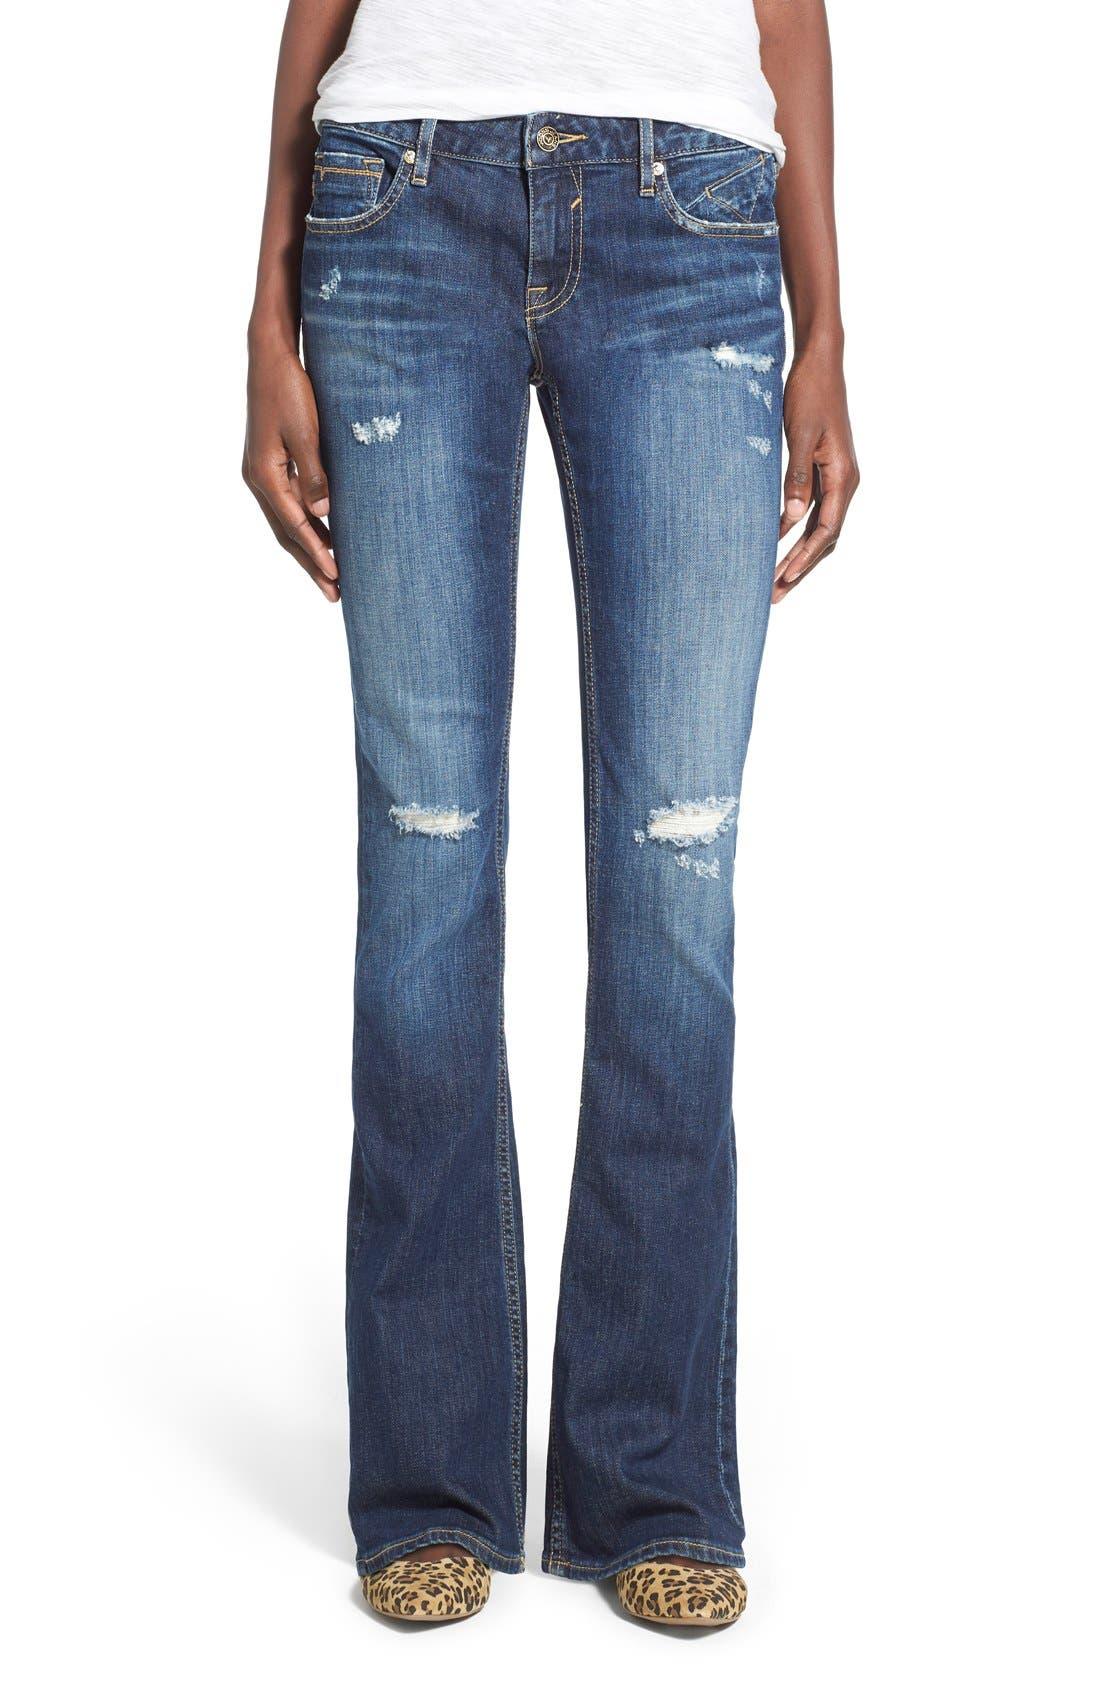 Alternate Image 1 Selected - Vigoss 'Chelsea' Bootcut Jeans (Dark Wash)